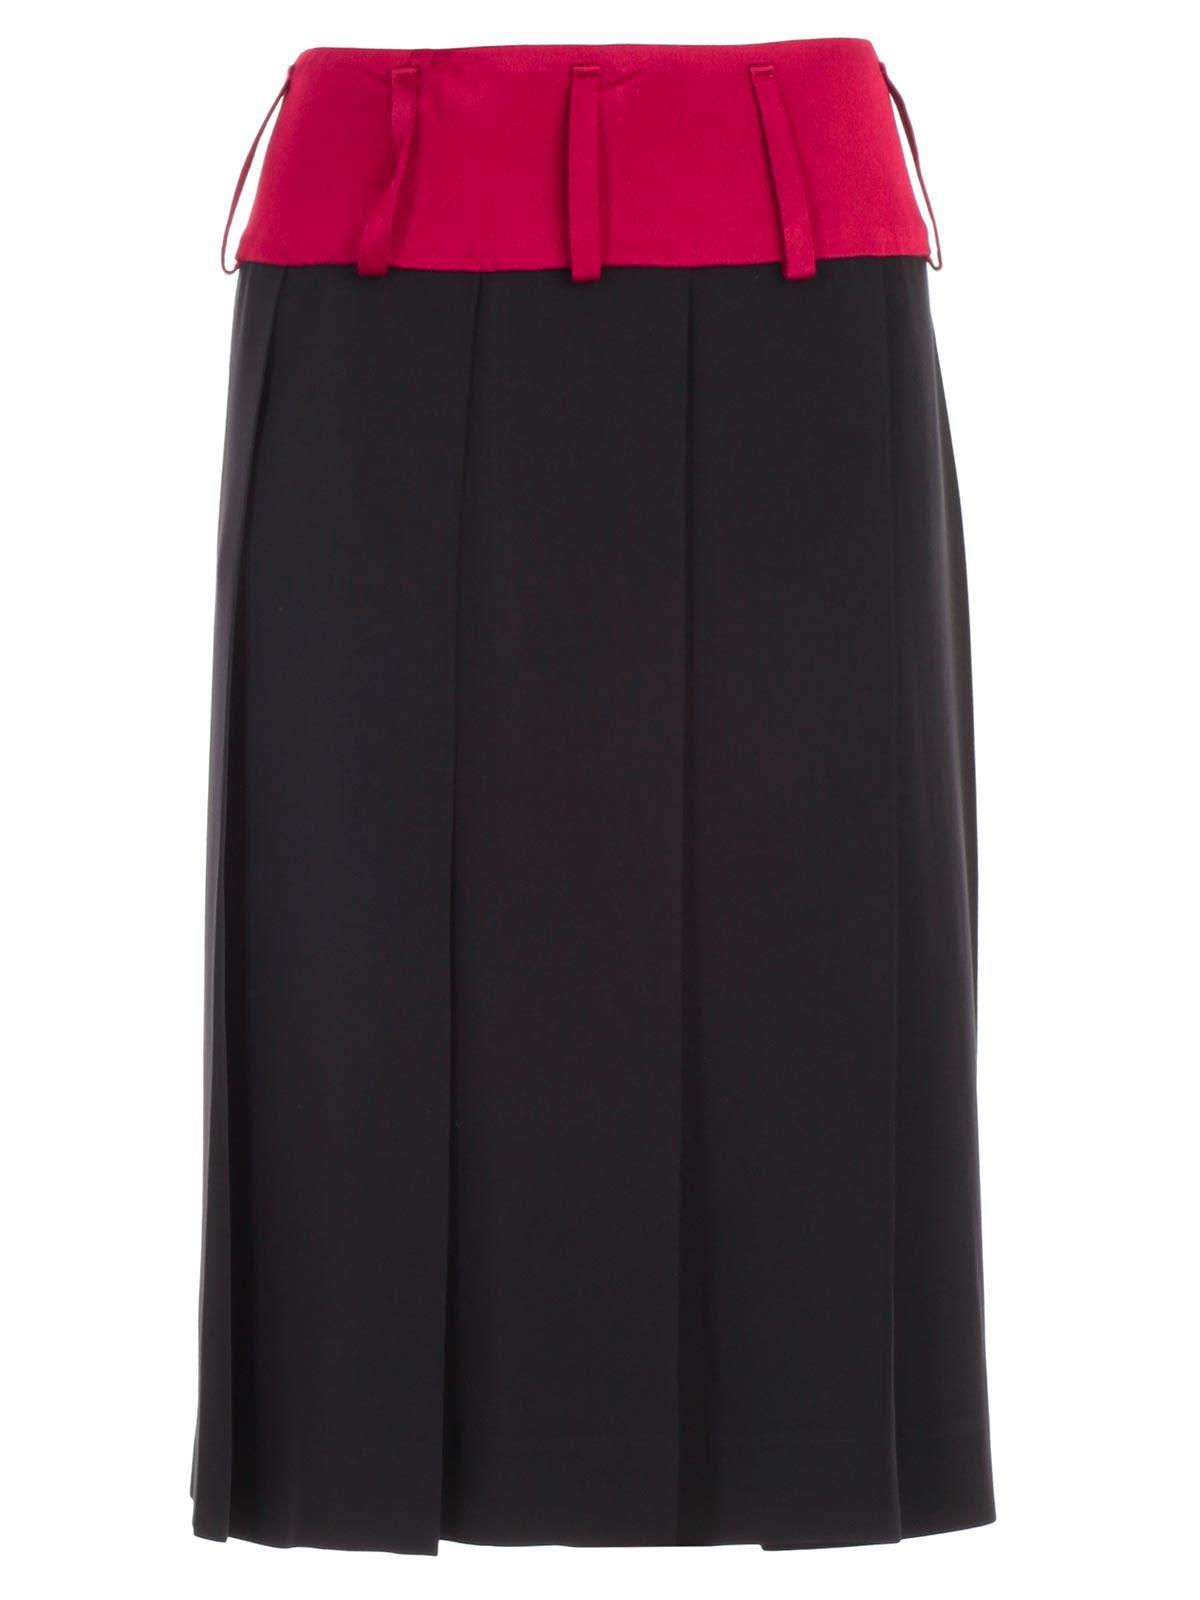 cb0b347b30 Marni Marni Pleated Skirt - Basic - 10781057 | italist